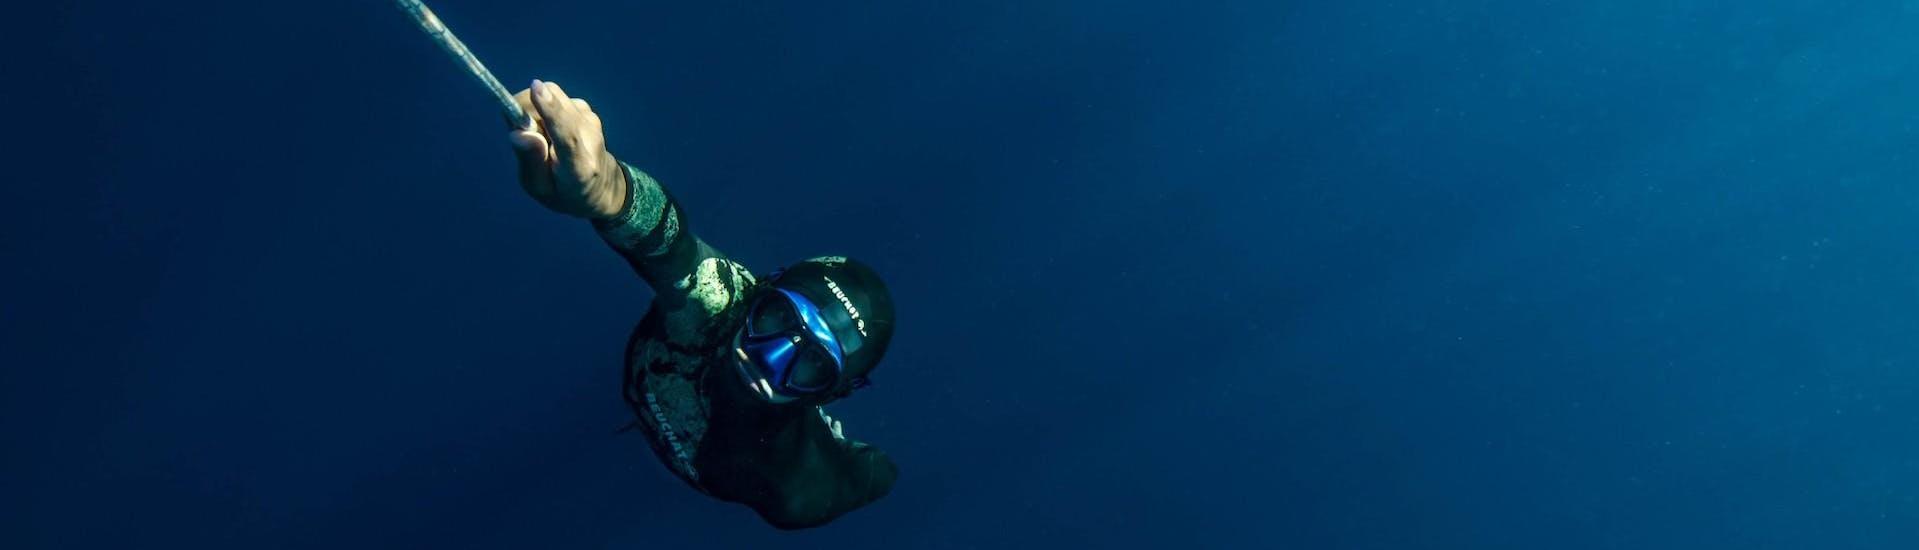 free-diving-course-in-annecy-lake-reda-apnea-hero